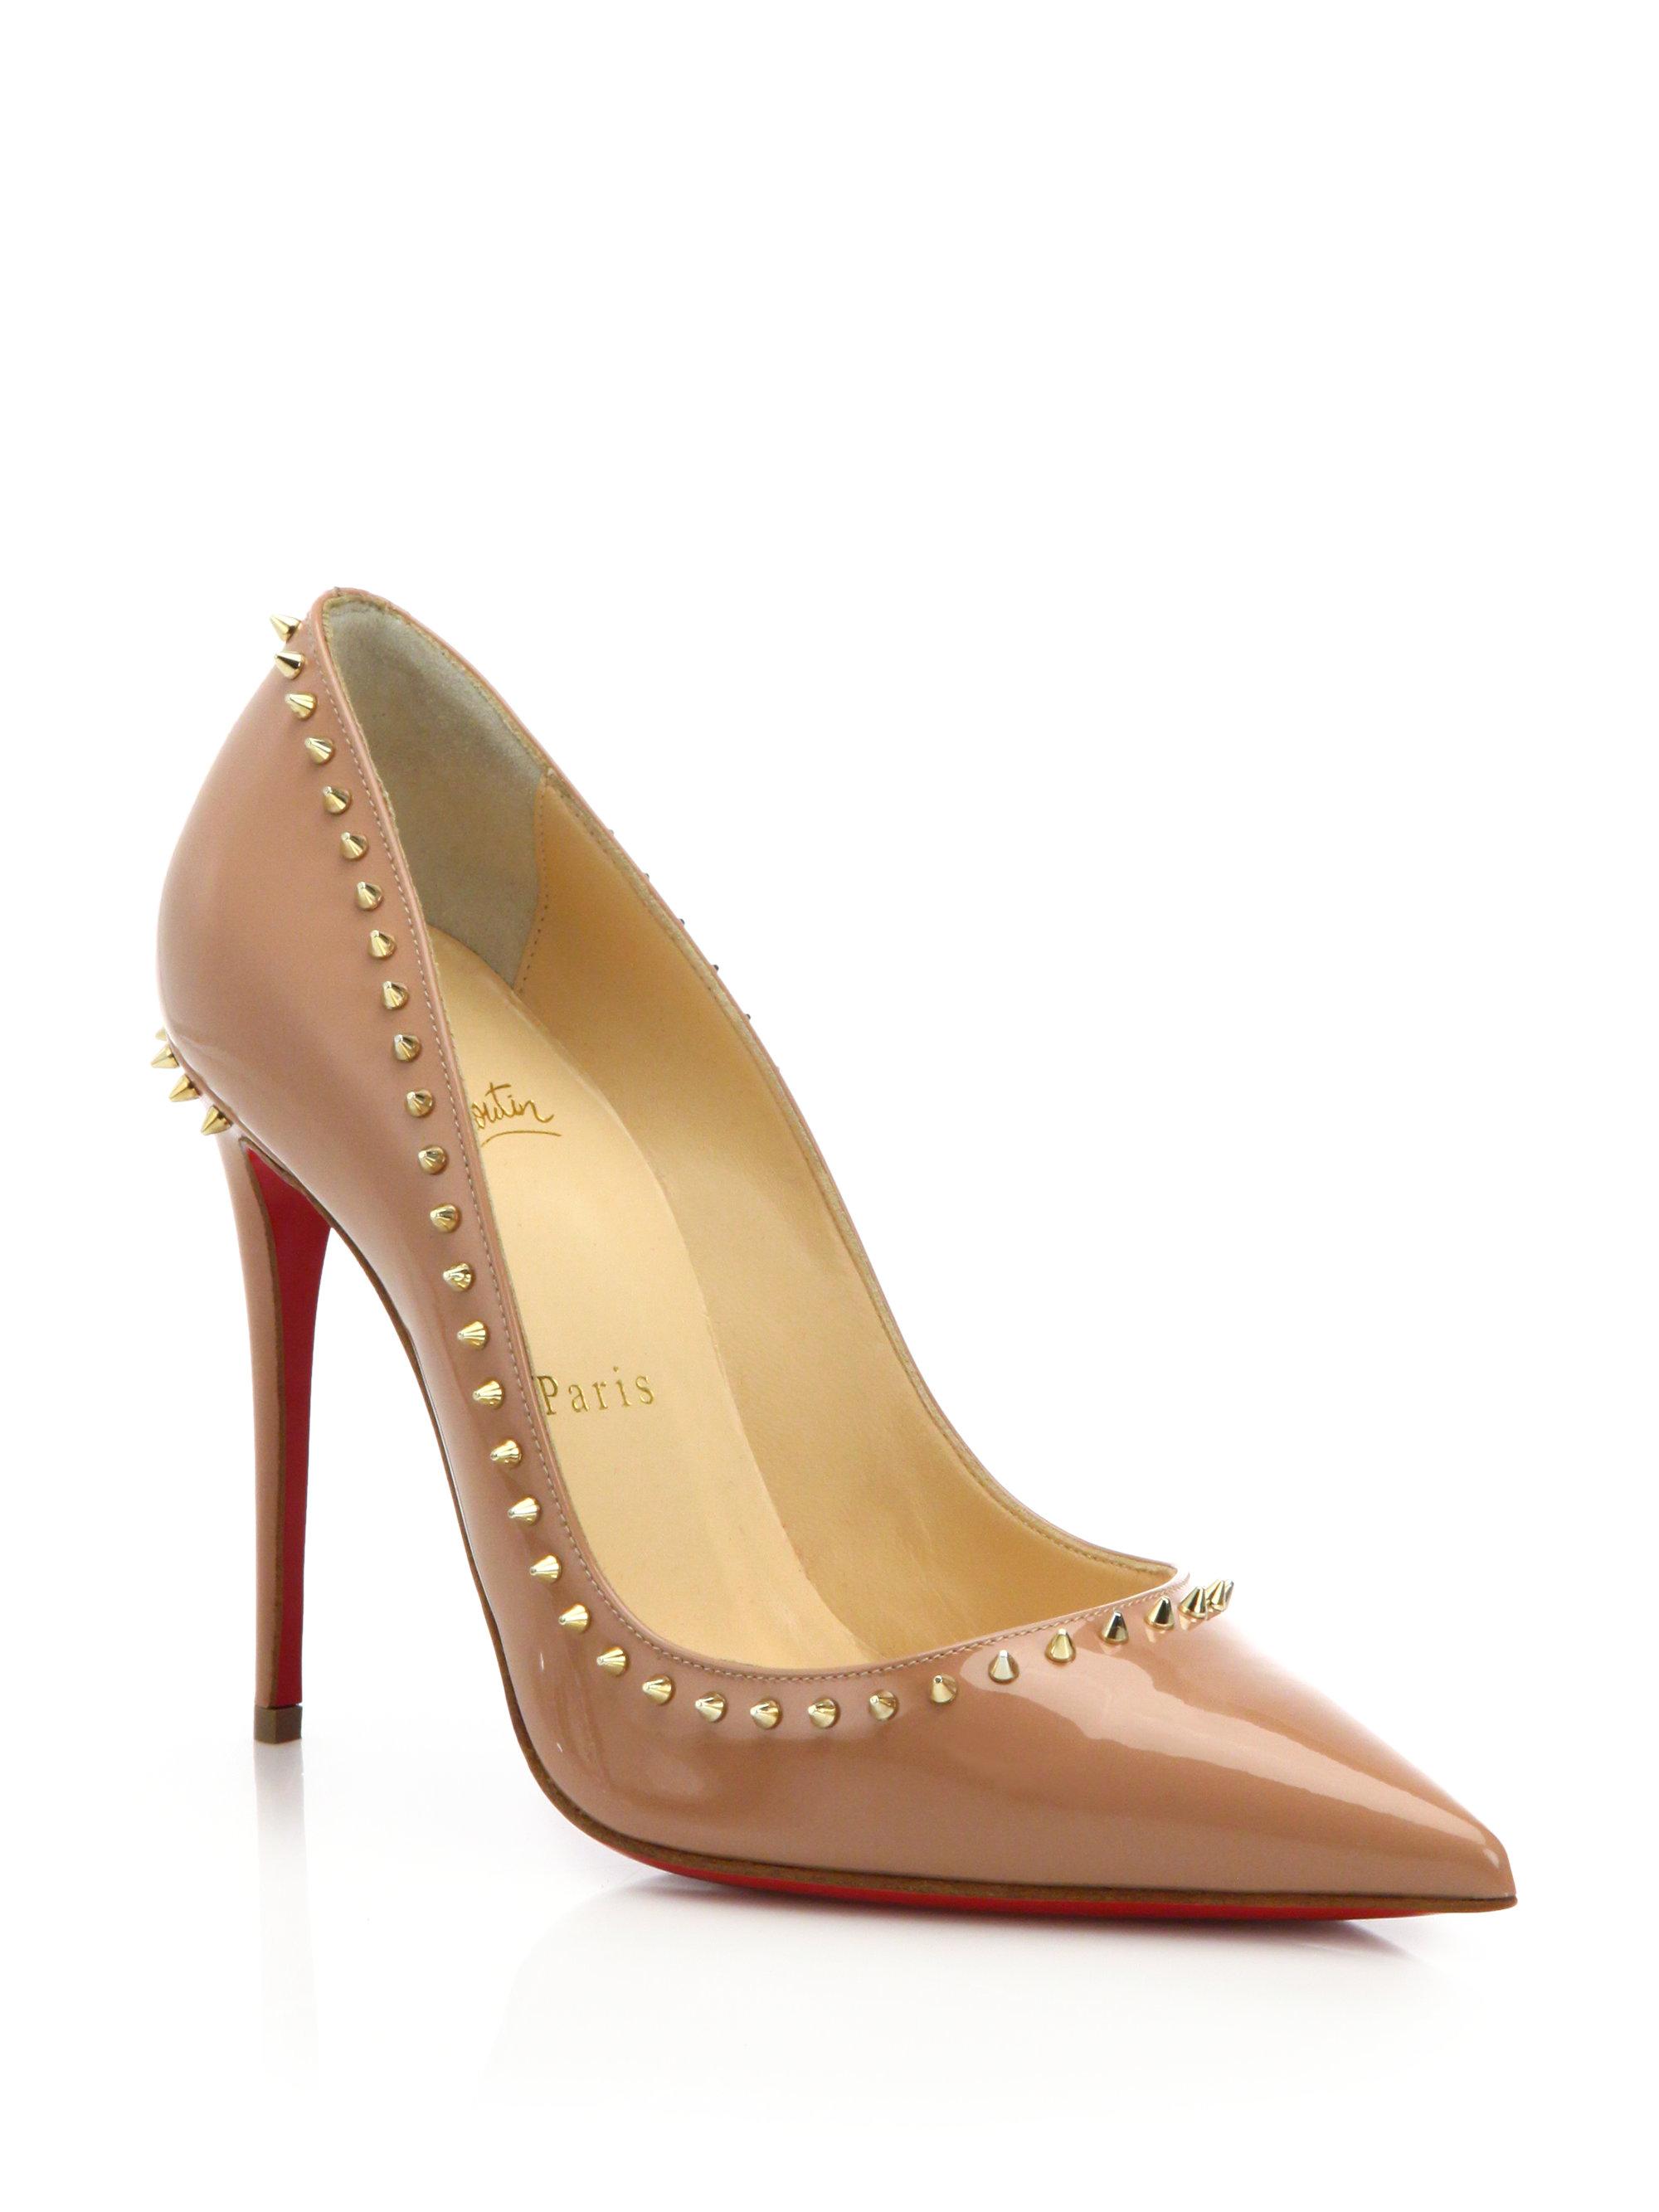 Artesur ? christian louboutin peep-toe wedges Black patent leather ...